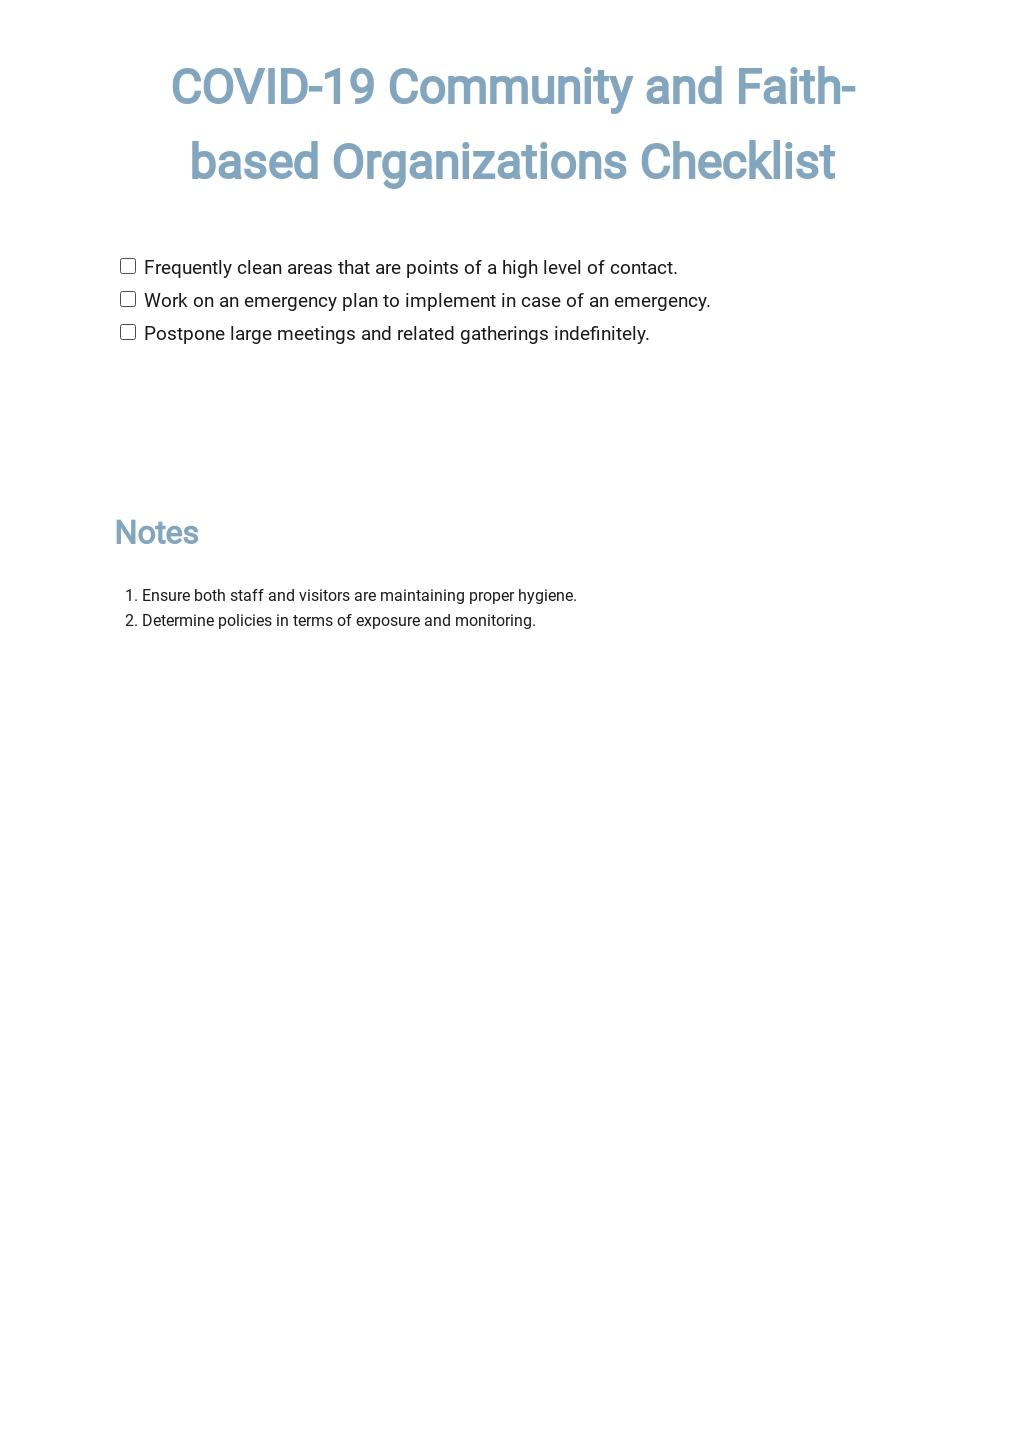 Coronavirus COVID-19 Community and Faith-based Organizations Checklist (CDC) Template